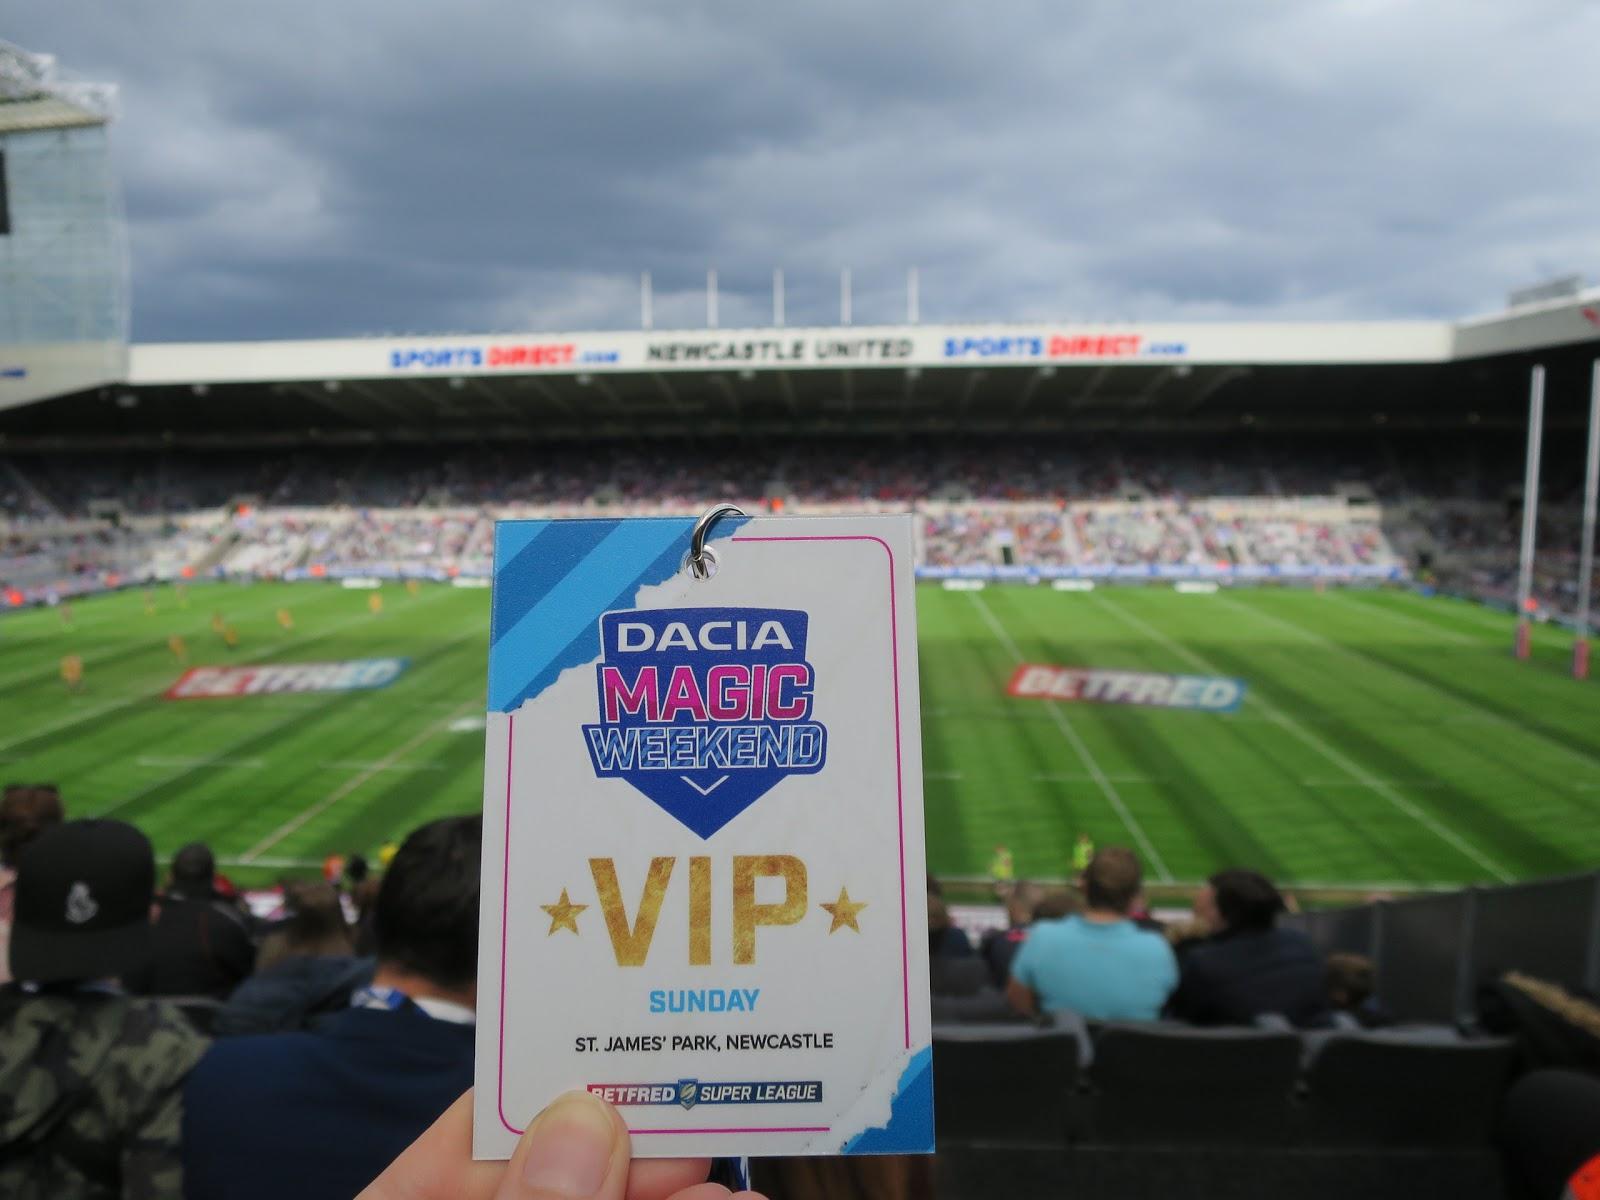 Dacia Magic Weekend – The VIP Treatment*